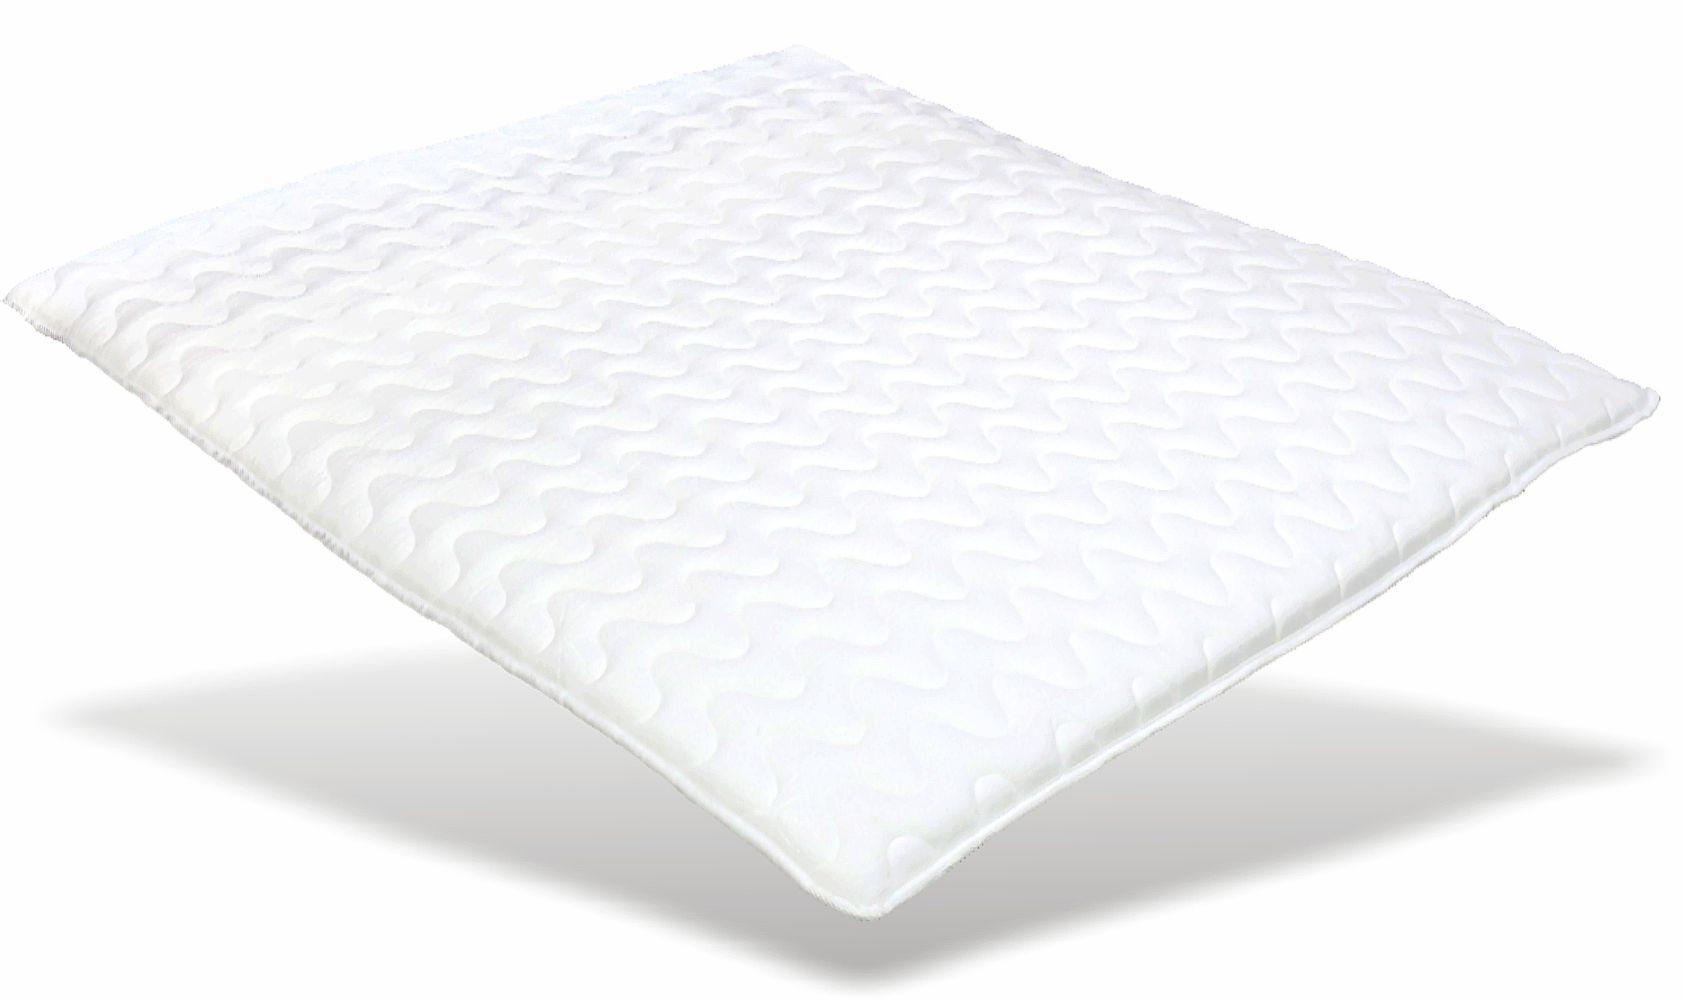 matratzen komfort topper 180x200cm kaltschaum ideal f r. Black Bedroom Furniture Sets. Home Design Ideas